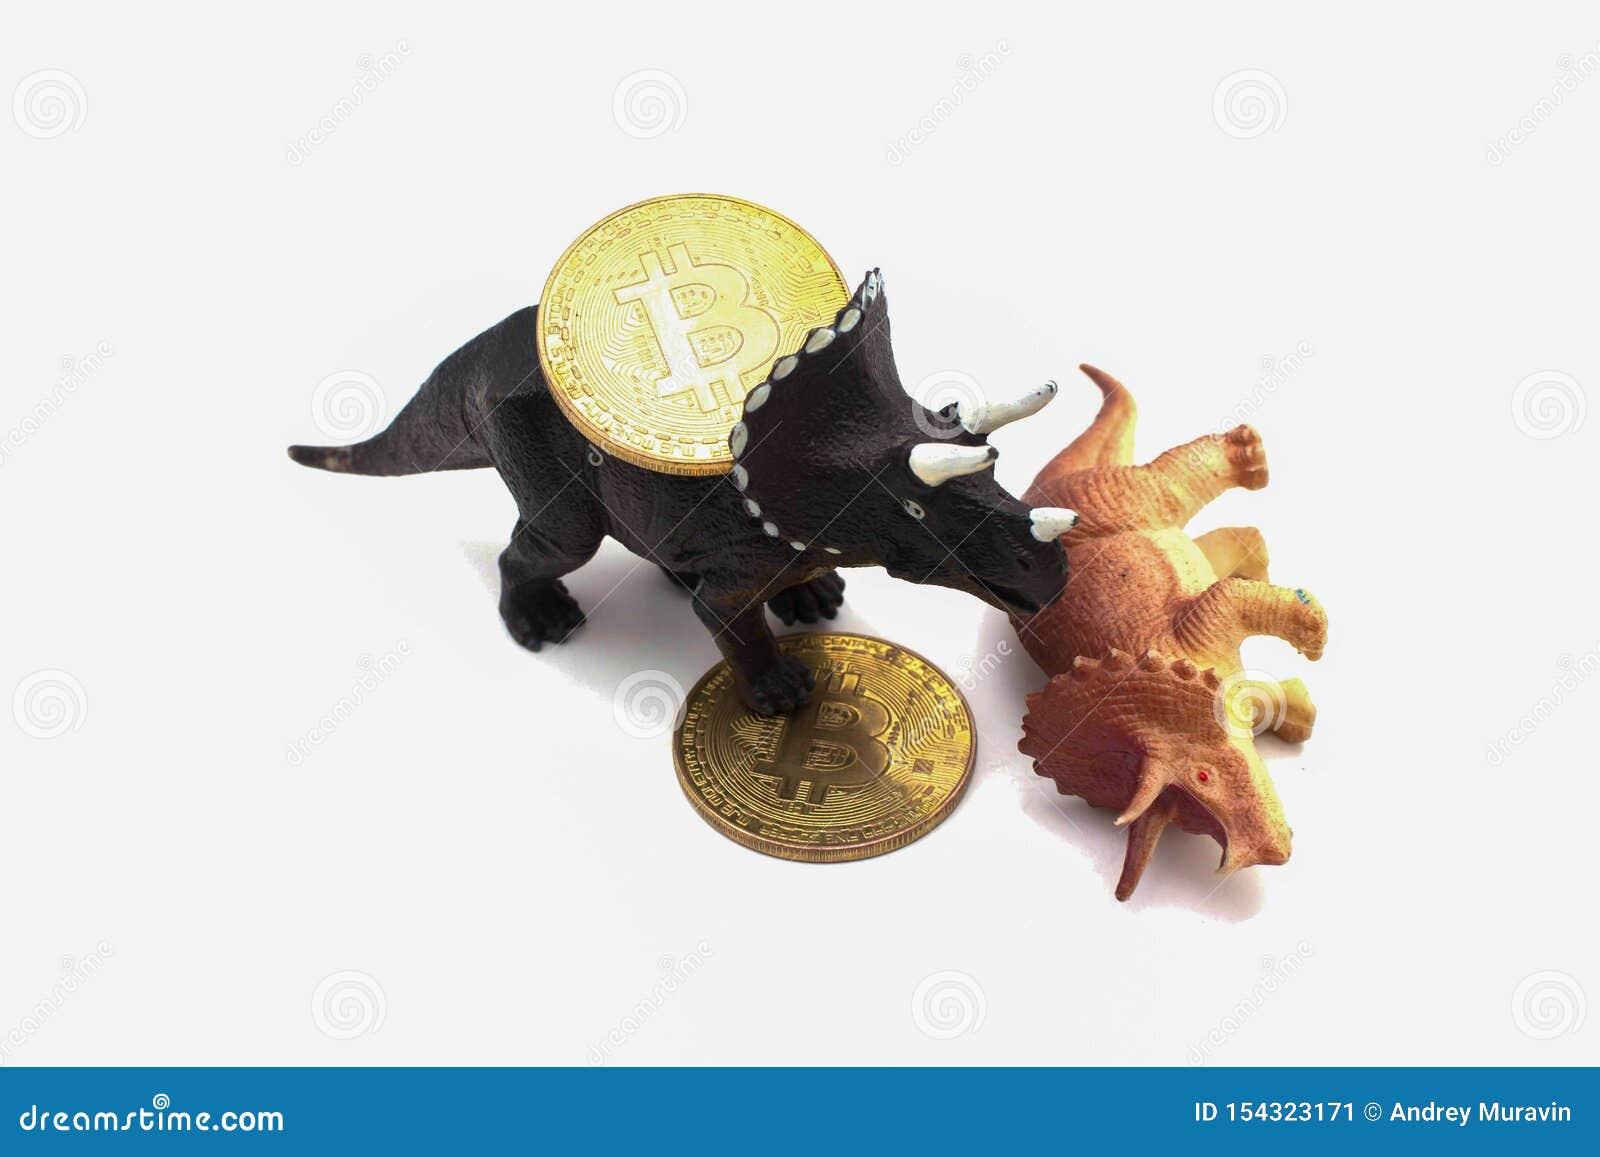 bitcoin toy